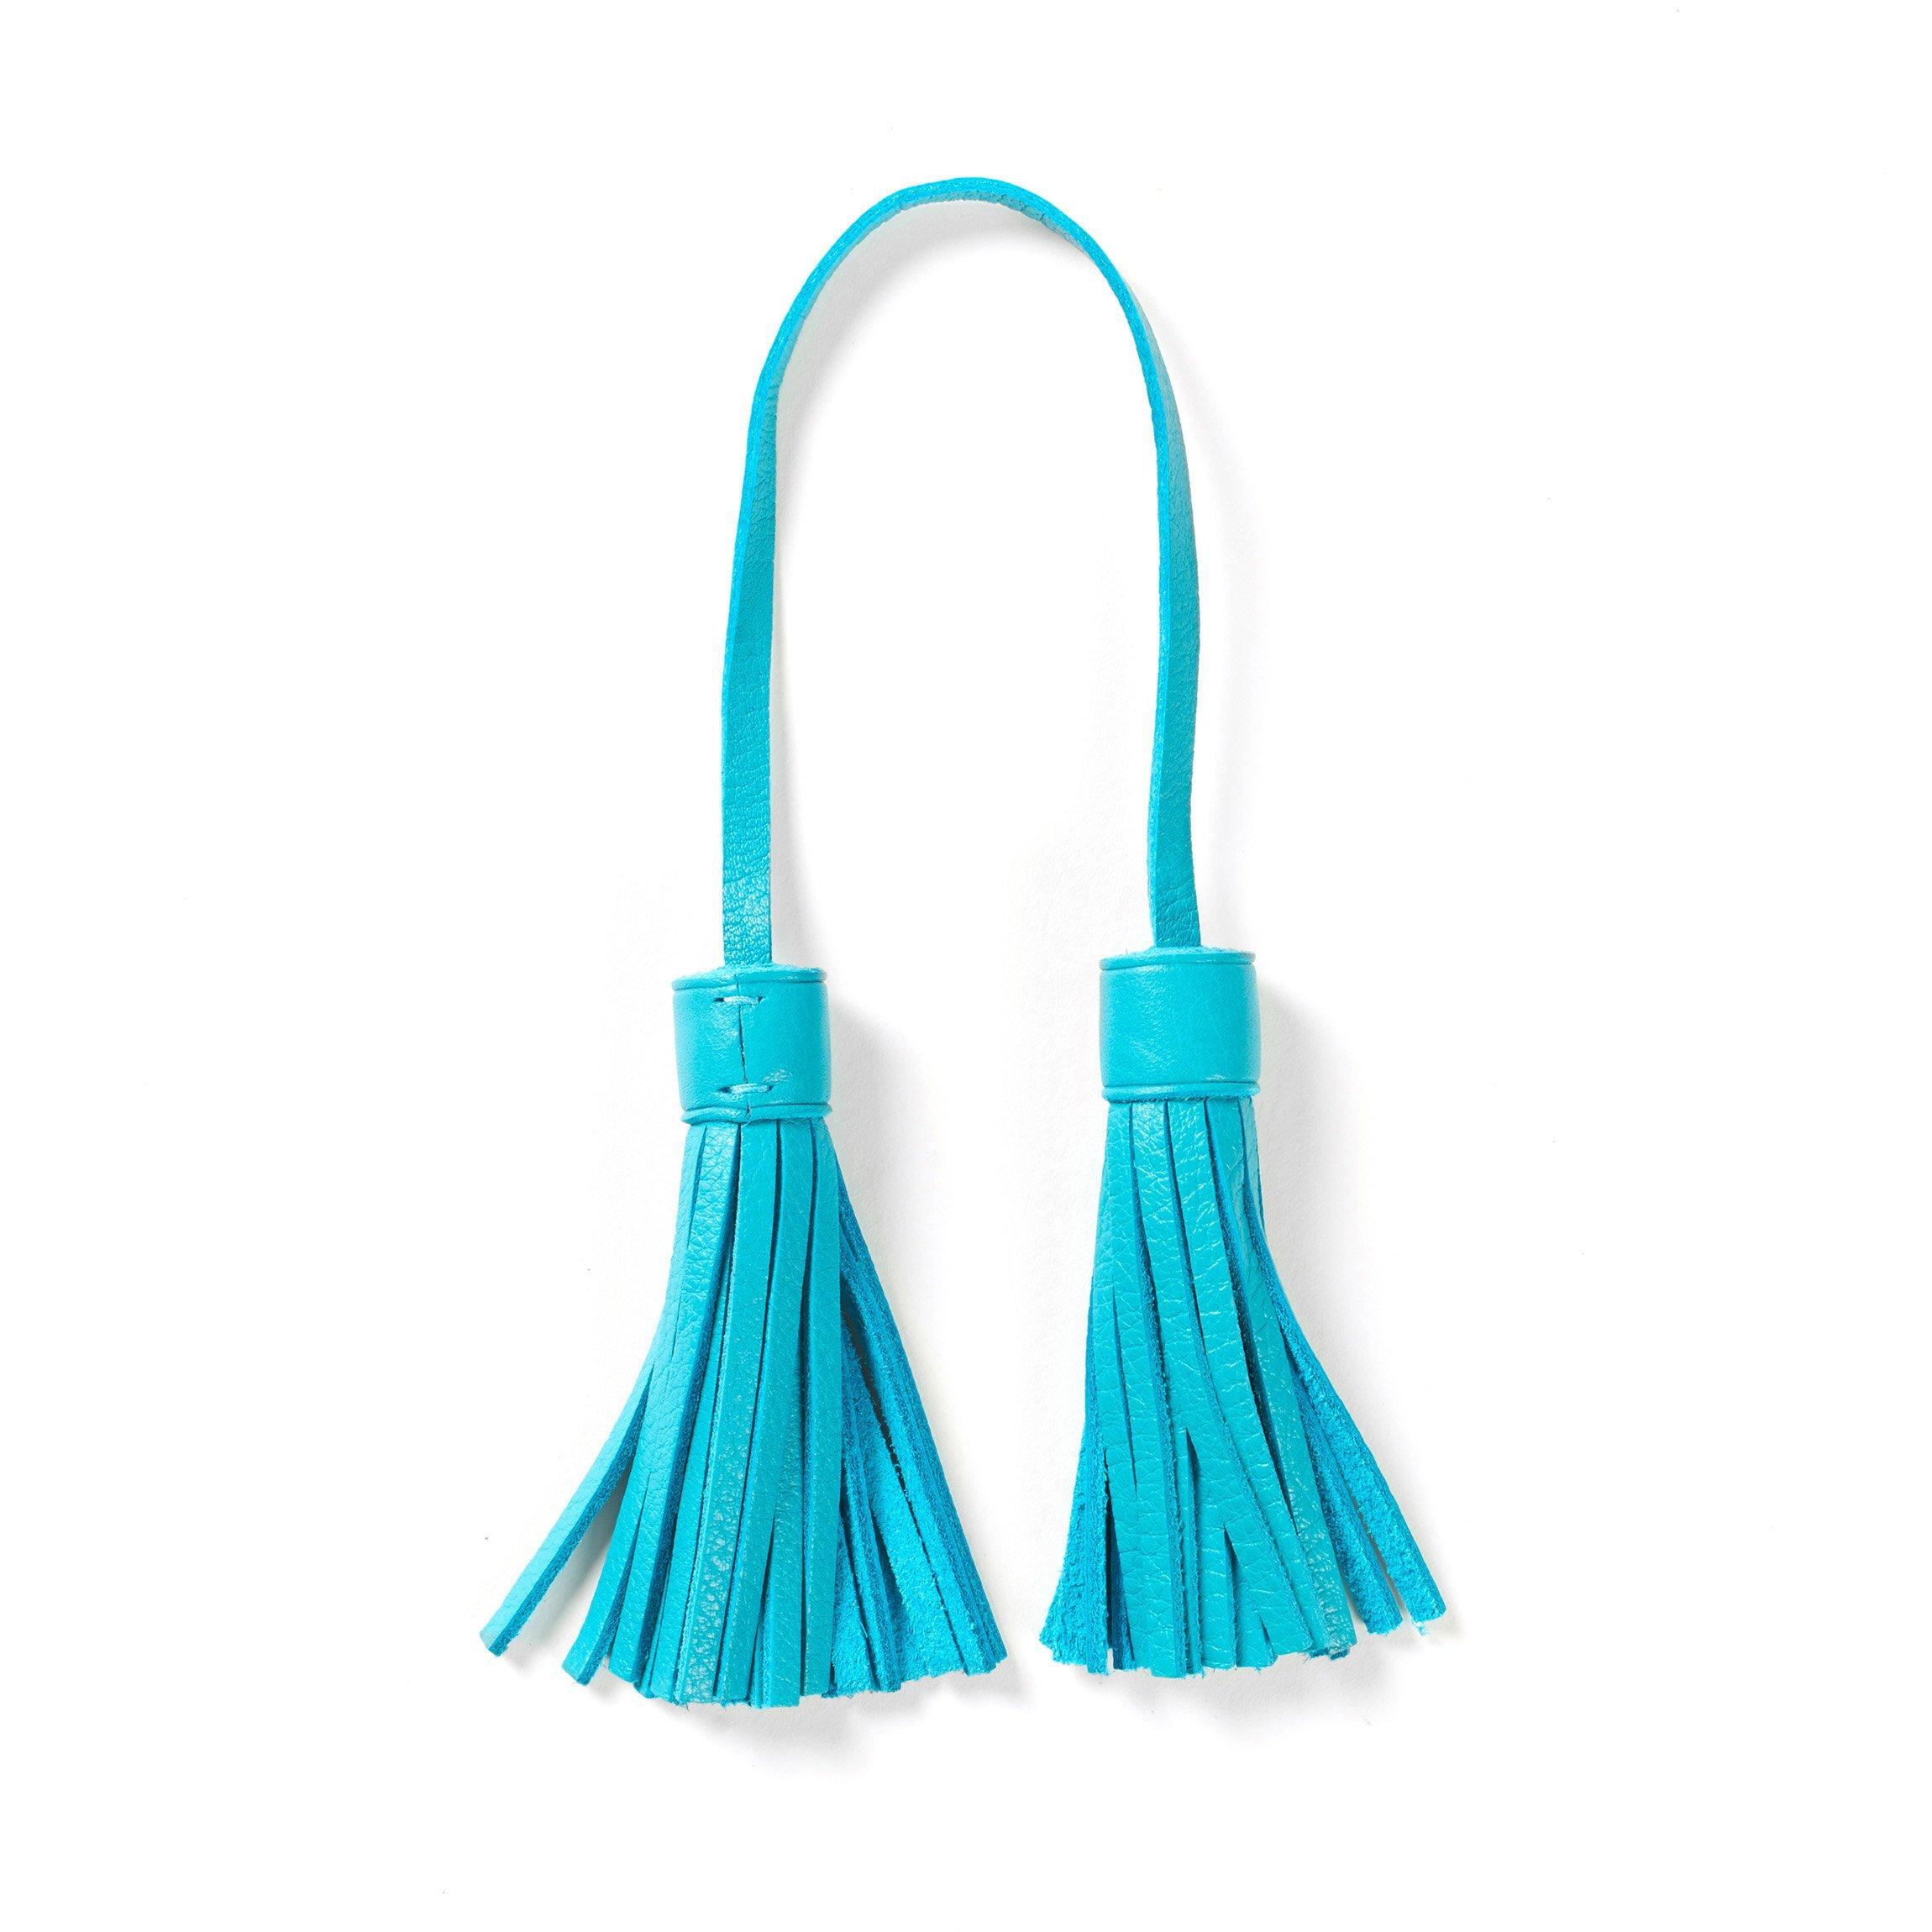 Tassel Bag Tag - Full Grain Leather - Teal (blue)